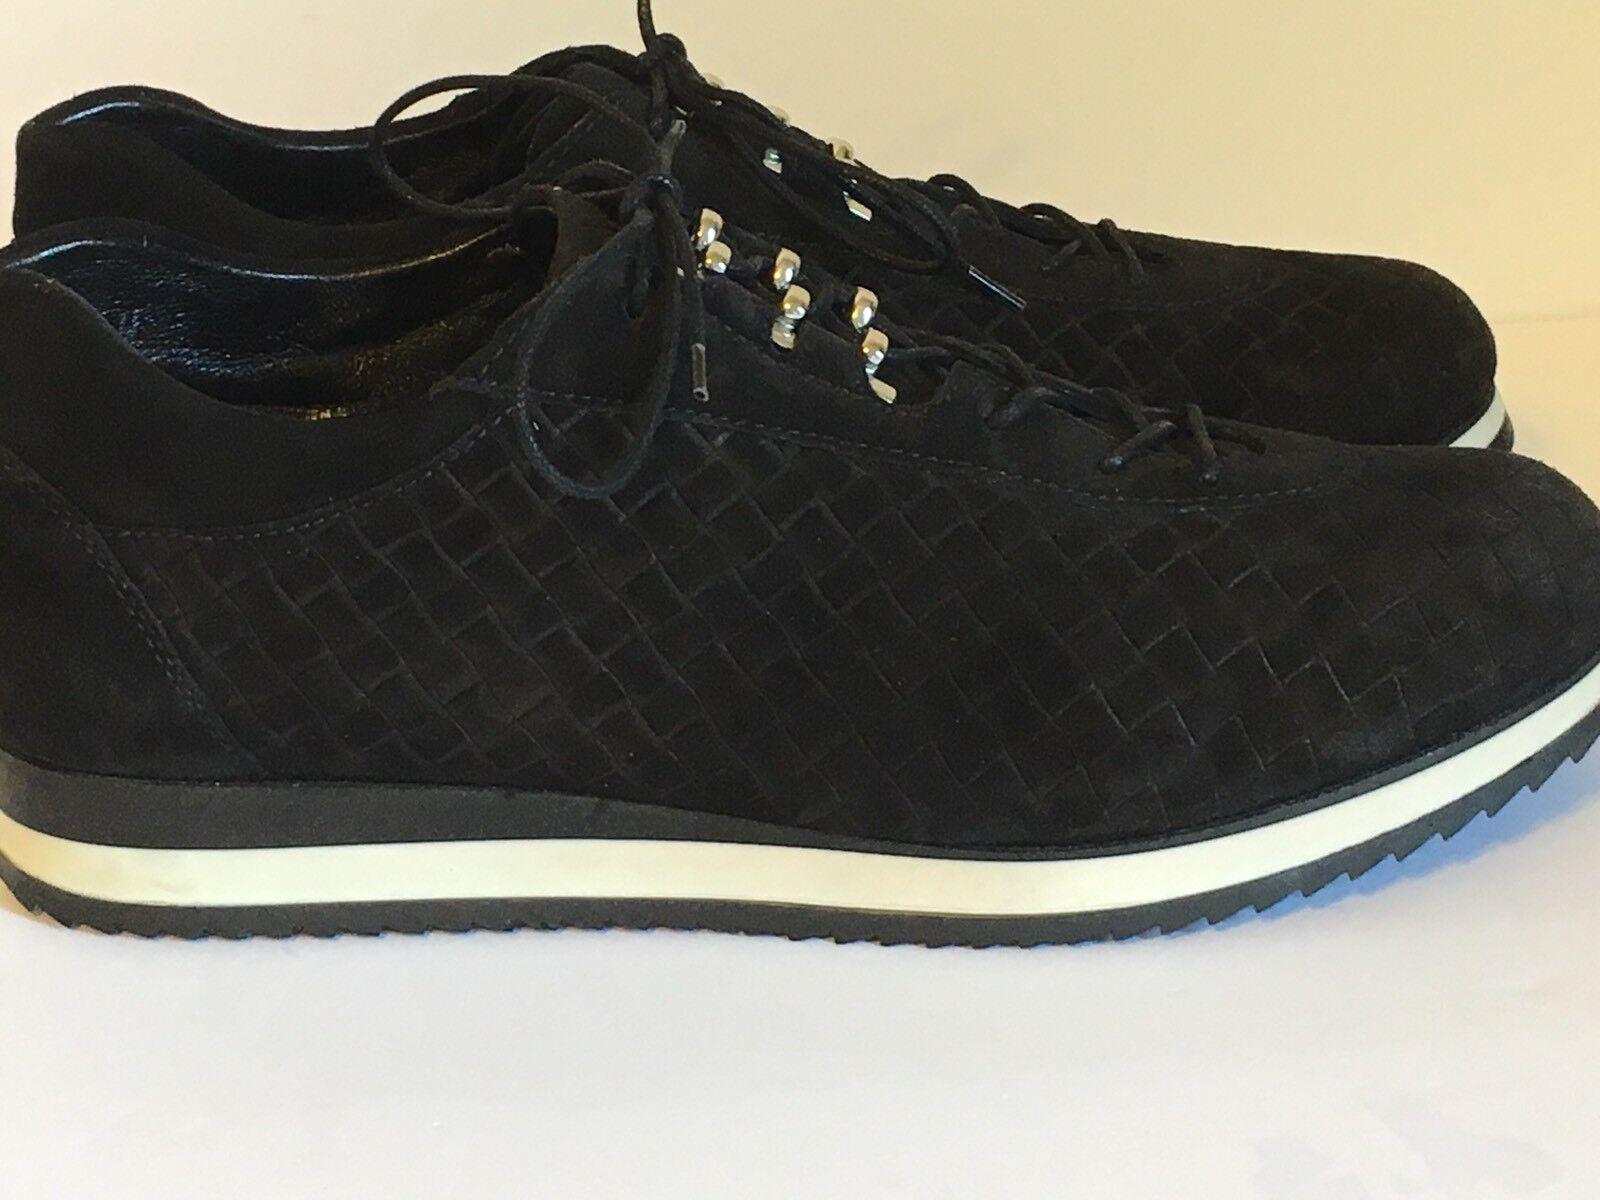 Stuart Weitzman Black Suede Relay Sneaker Black White Size 7.5 M Free Shipping